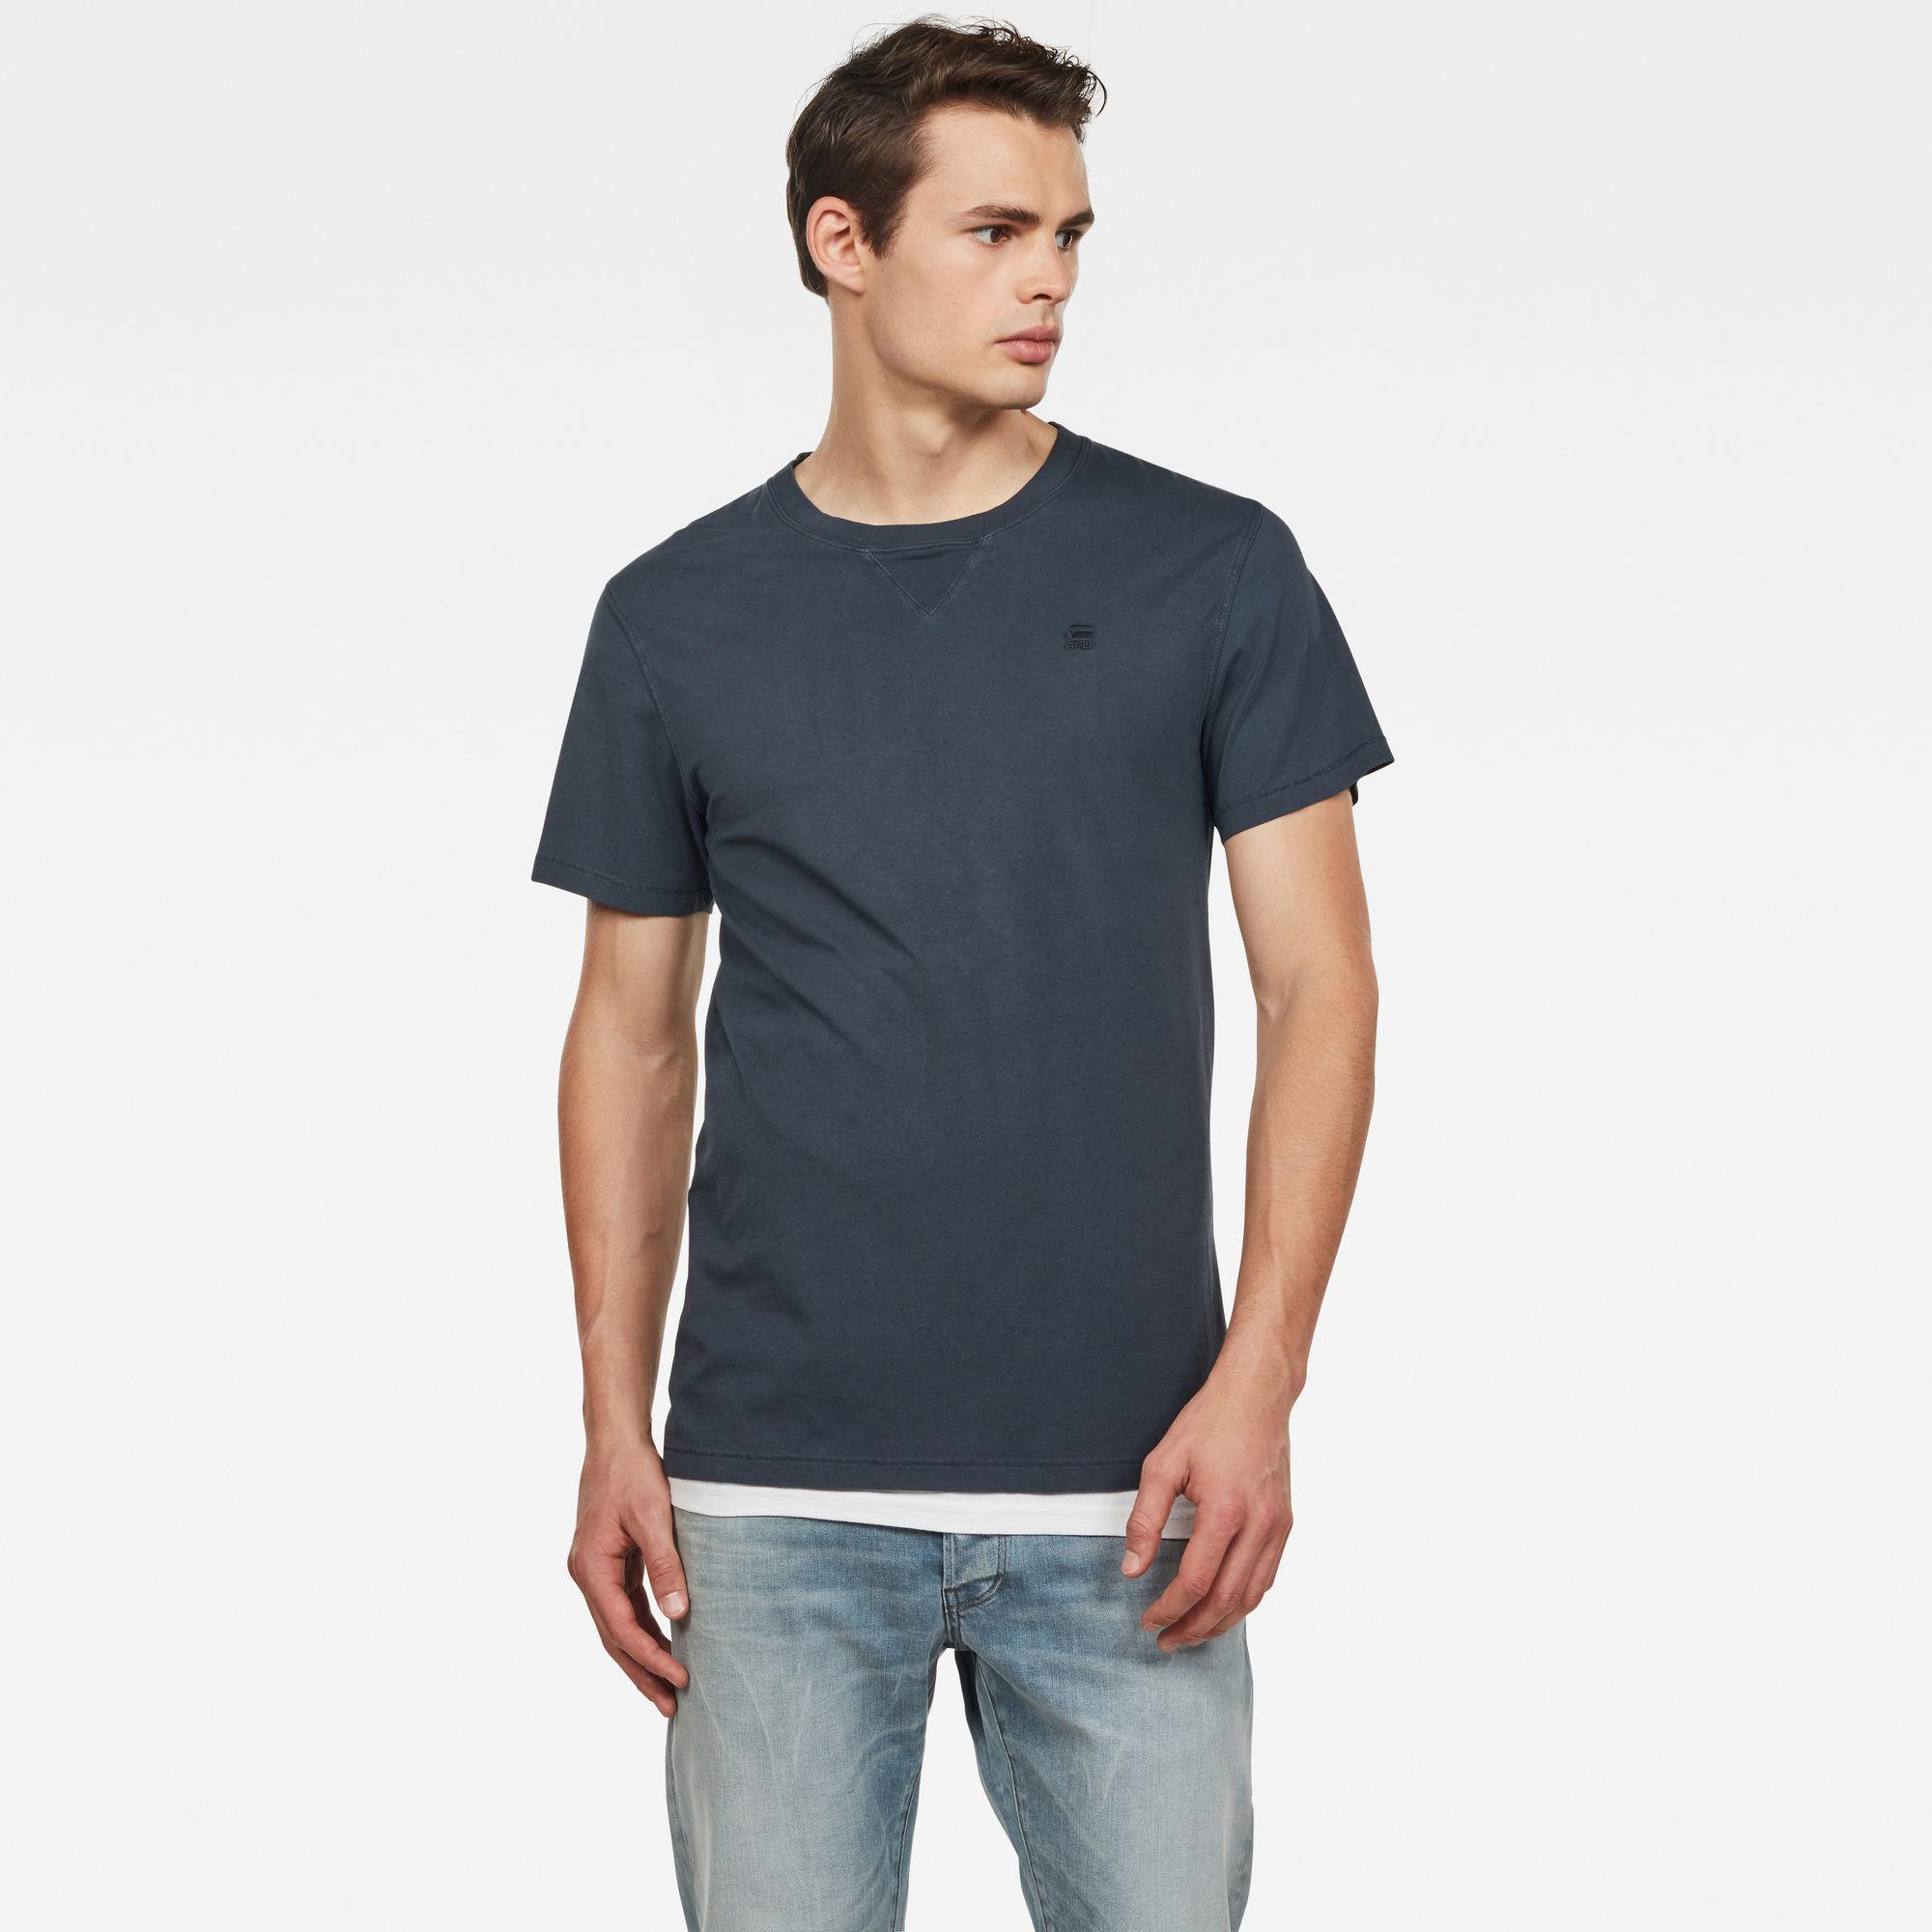 G-Star RAW Heren Earth Ronde Hals T-Shirt Donkerblauw